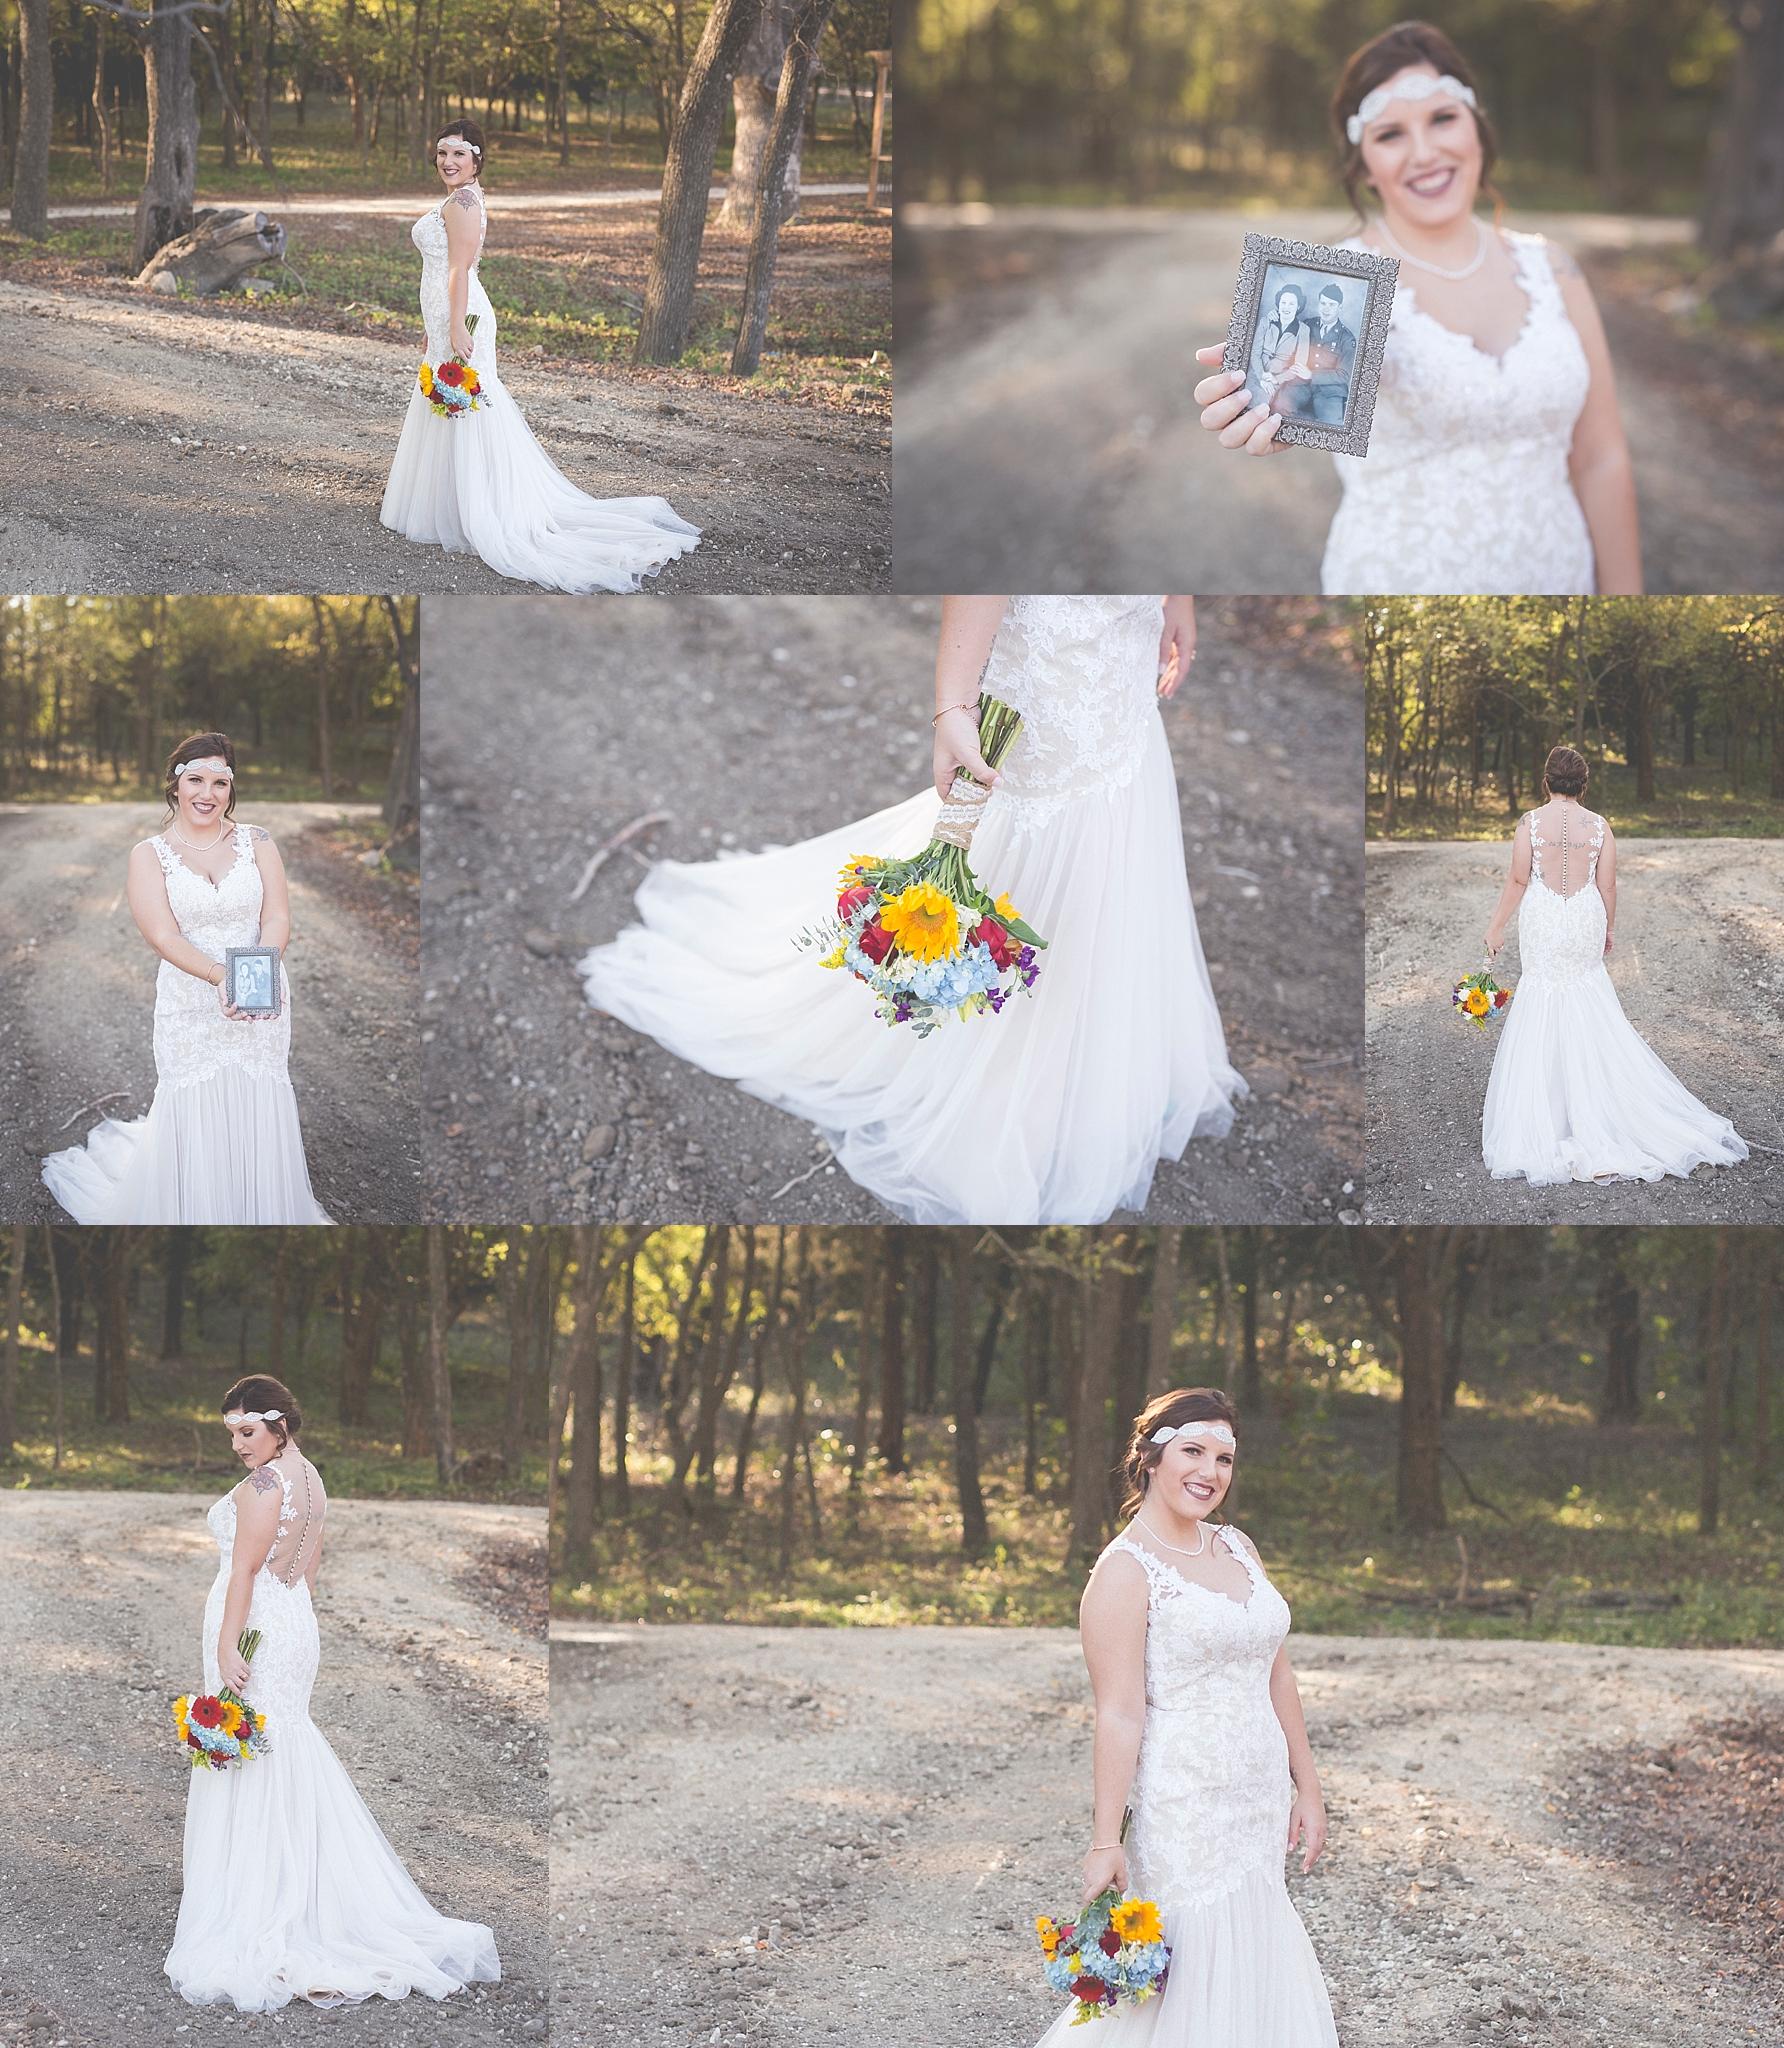 engagement-photos-love-wedding-como-columbia-missouri-jefferson-city-lake-ozark-springfield-city-bridals-bride.jpg